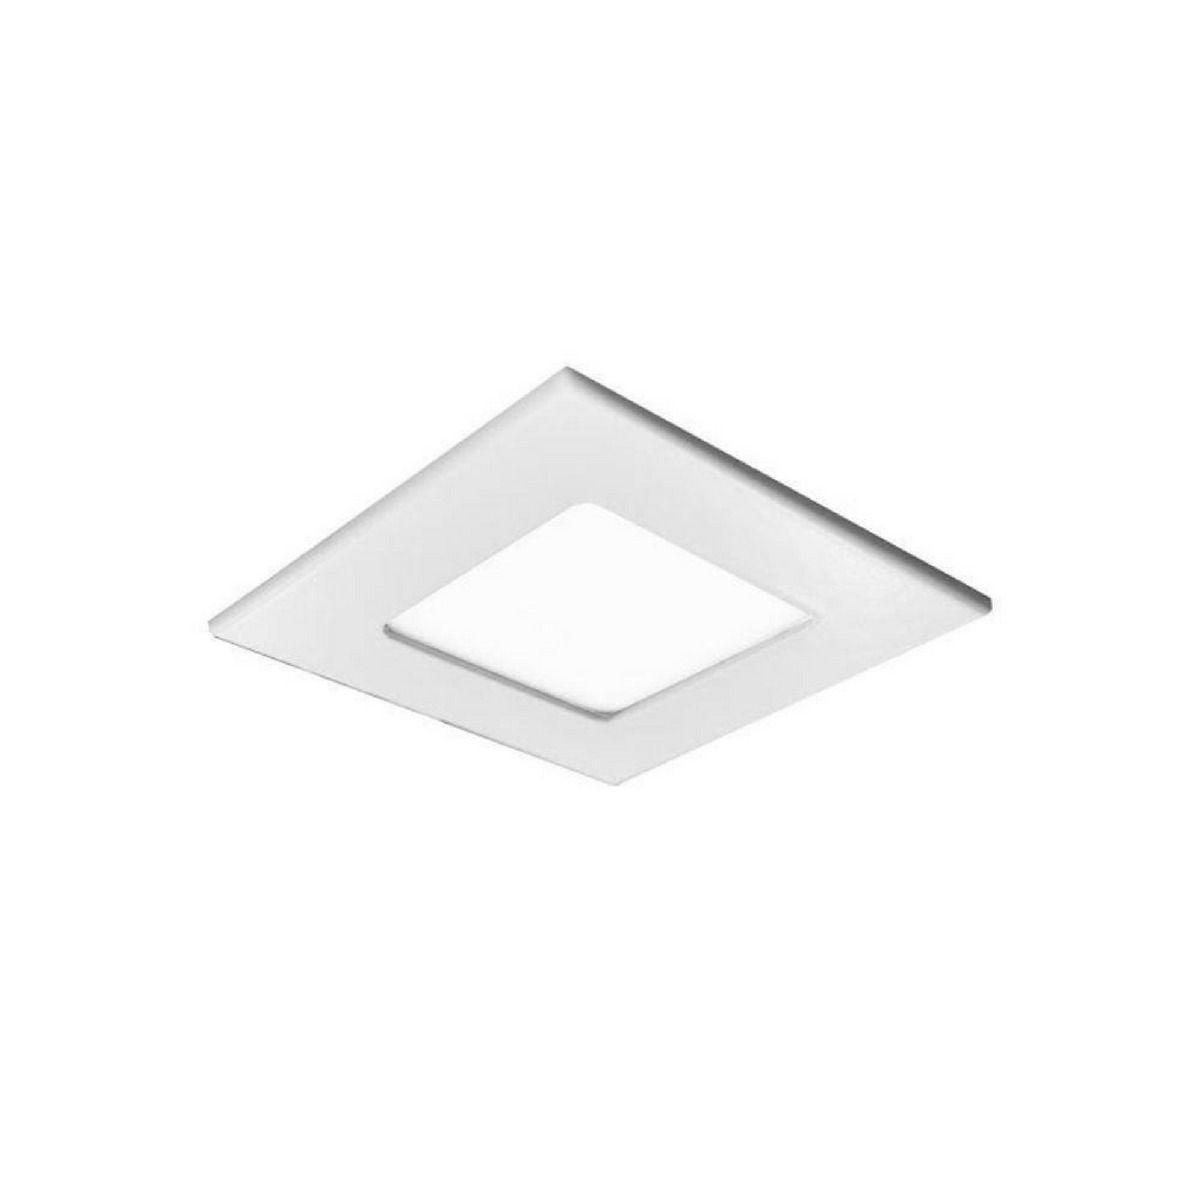 KIT 15 PLAFON LED EMBUTIR QUADRADO 6W 12X12CM BIVOLT